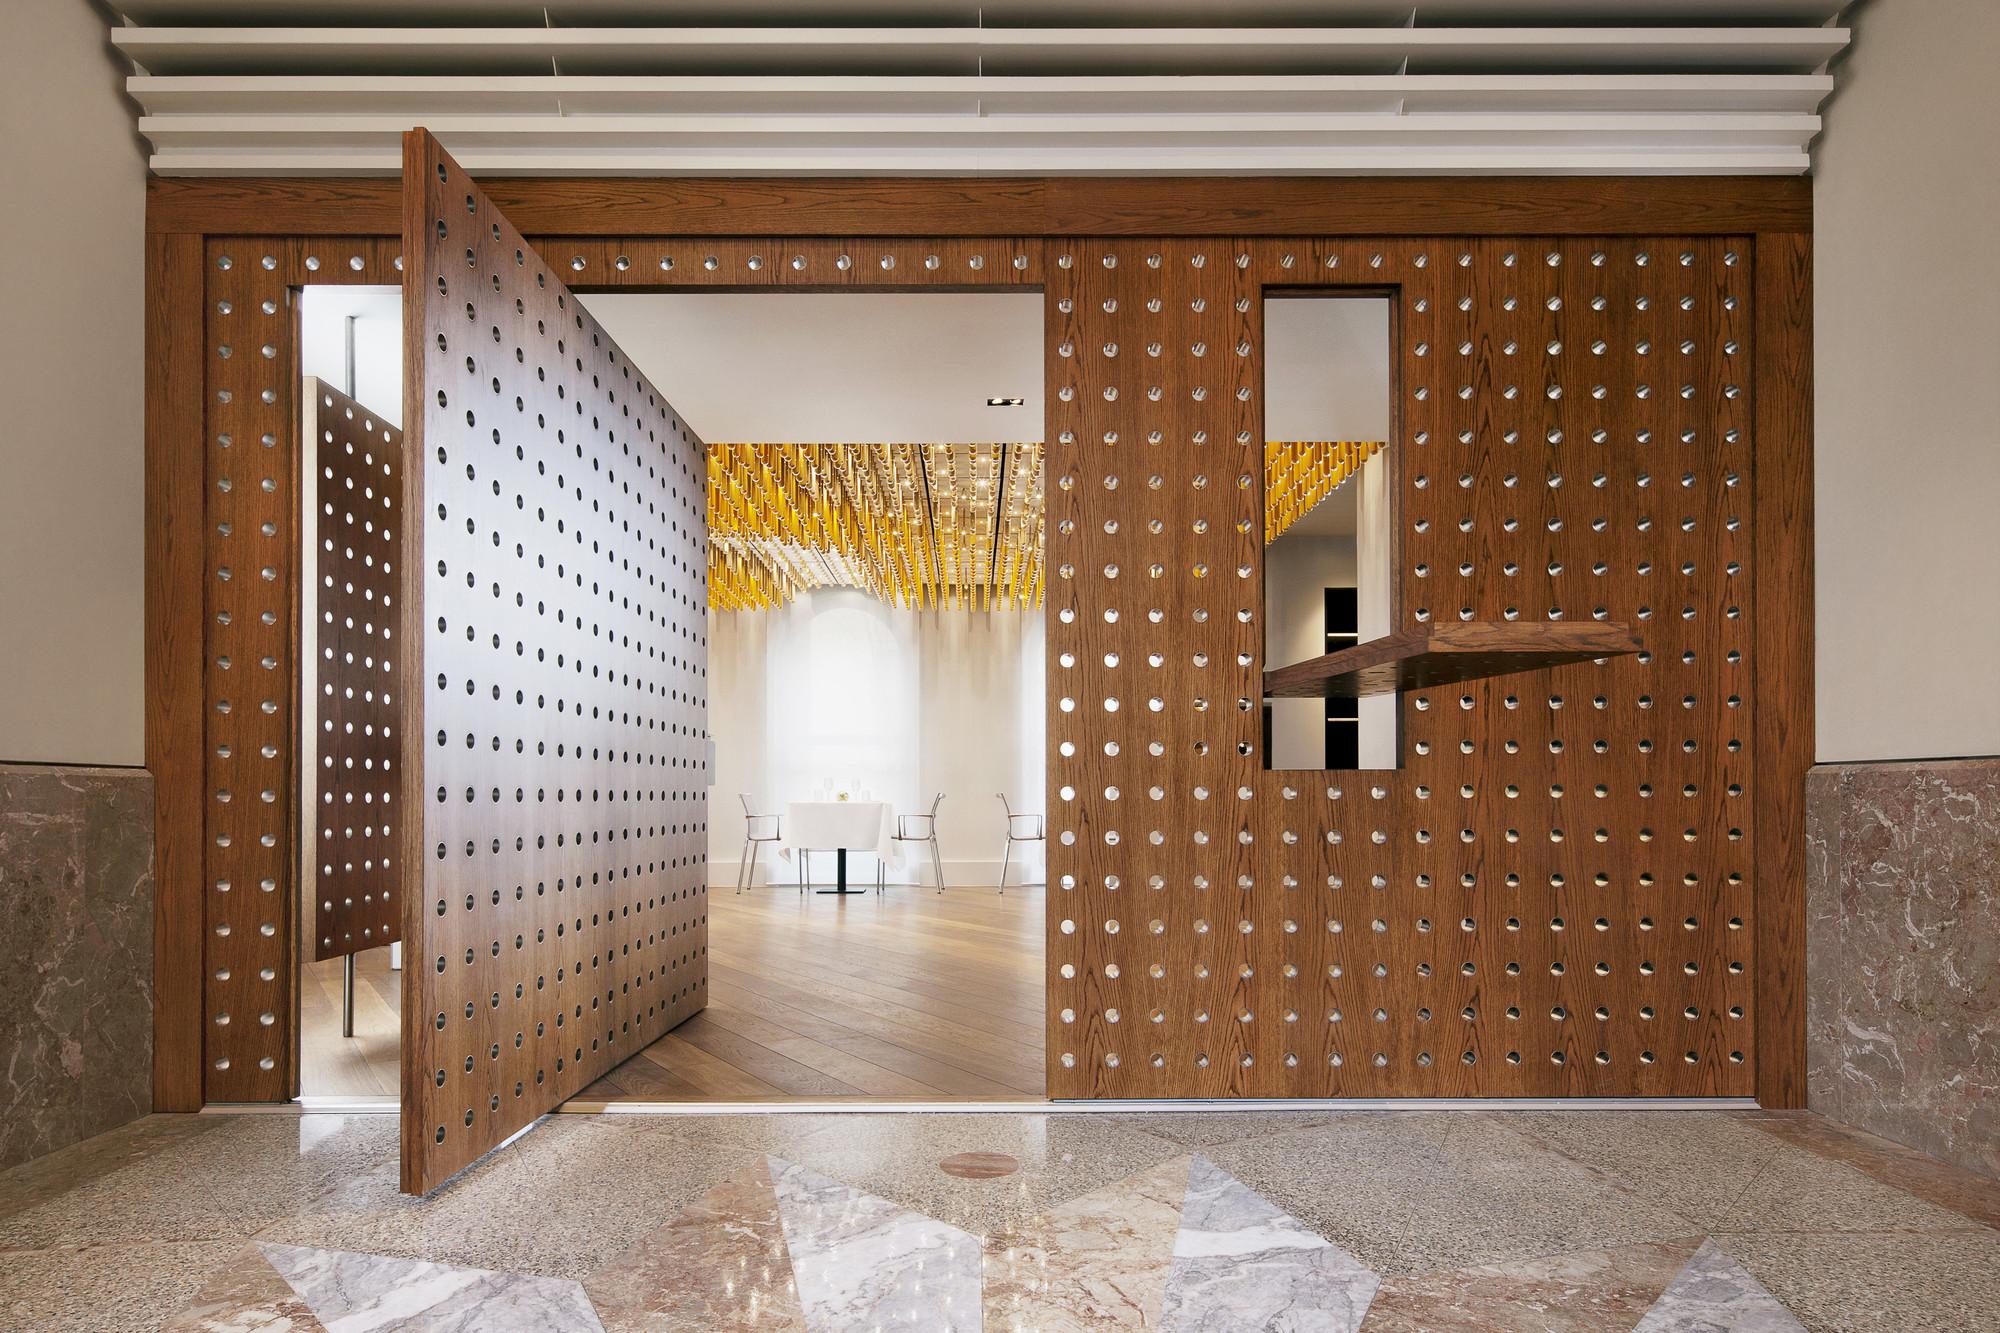 Gallery of 2014 Restaurant Bar Design Award Winners 14